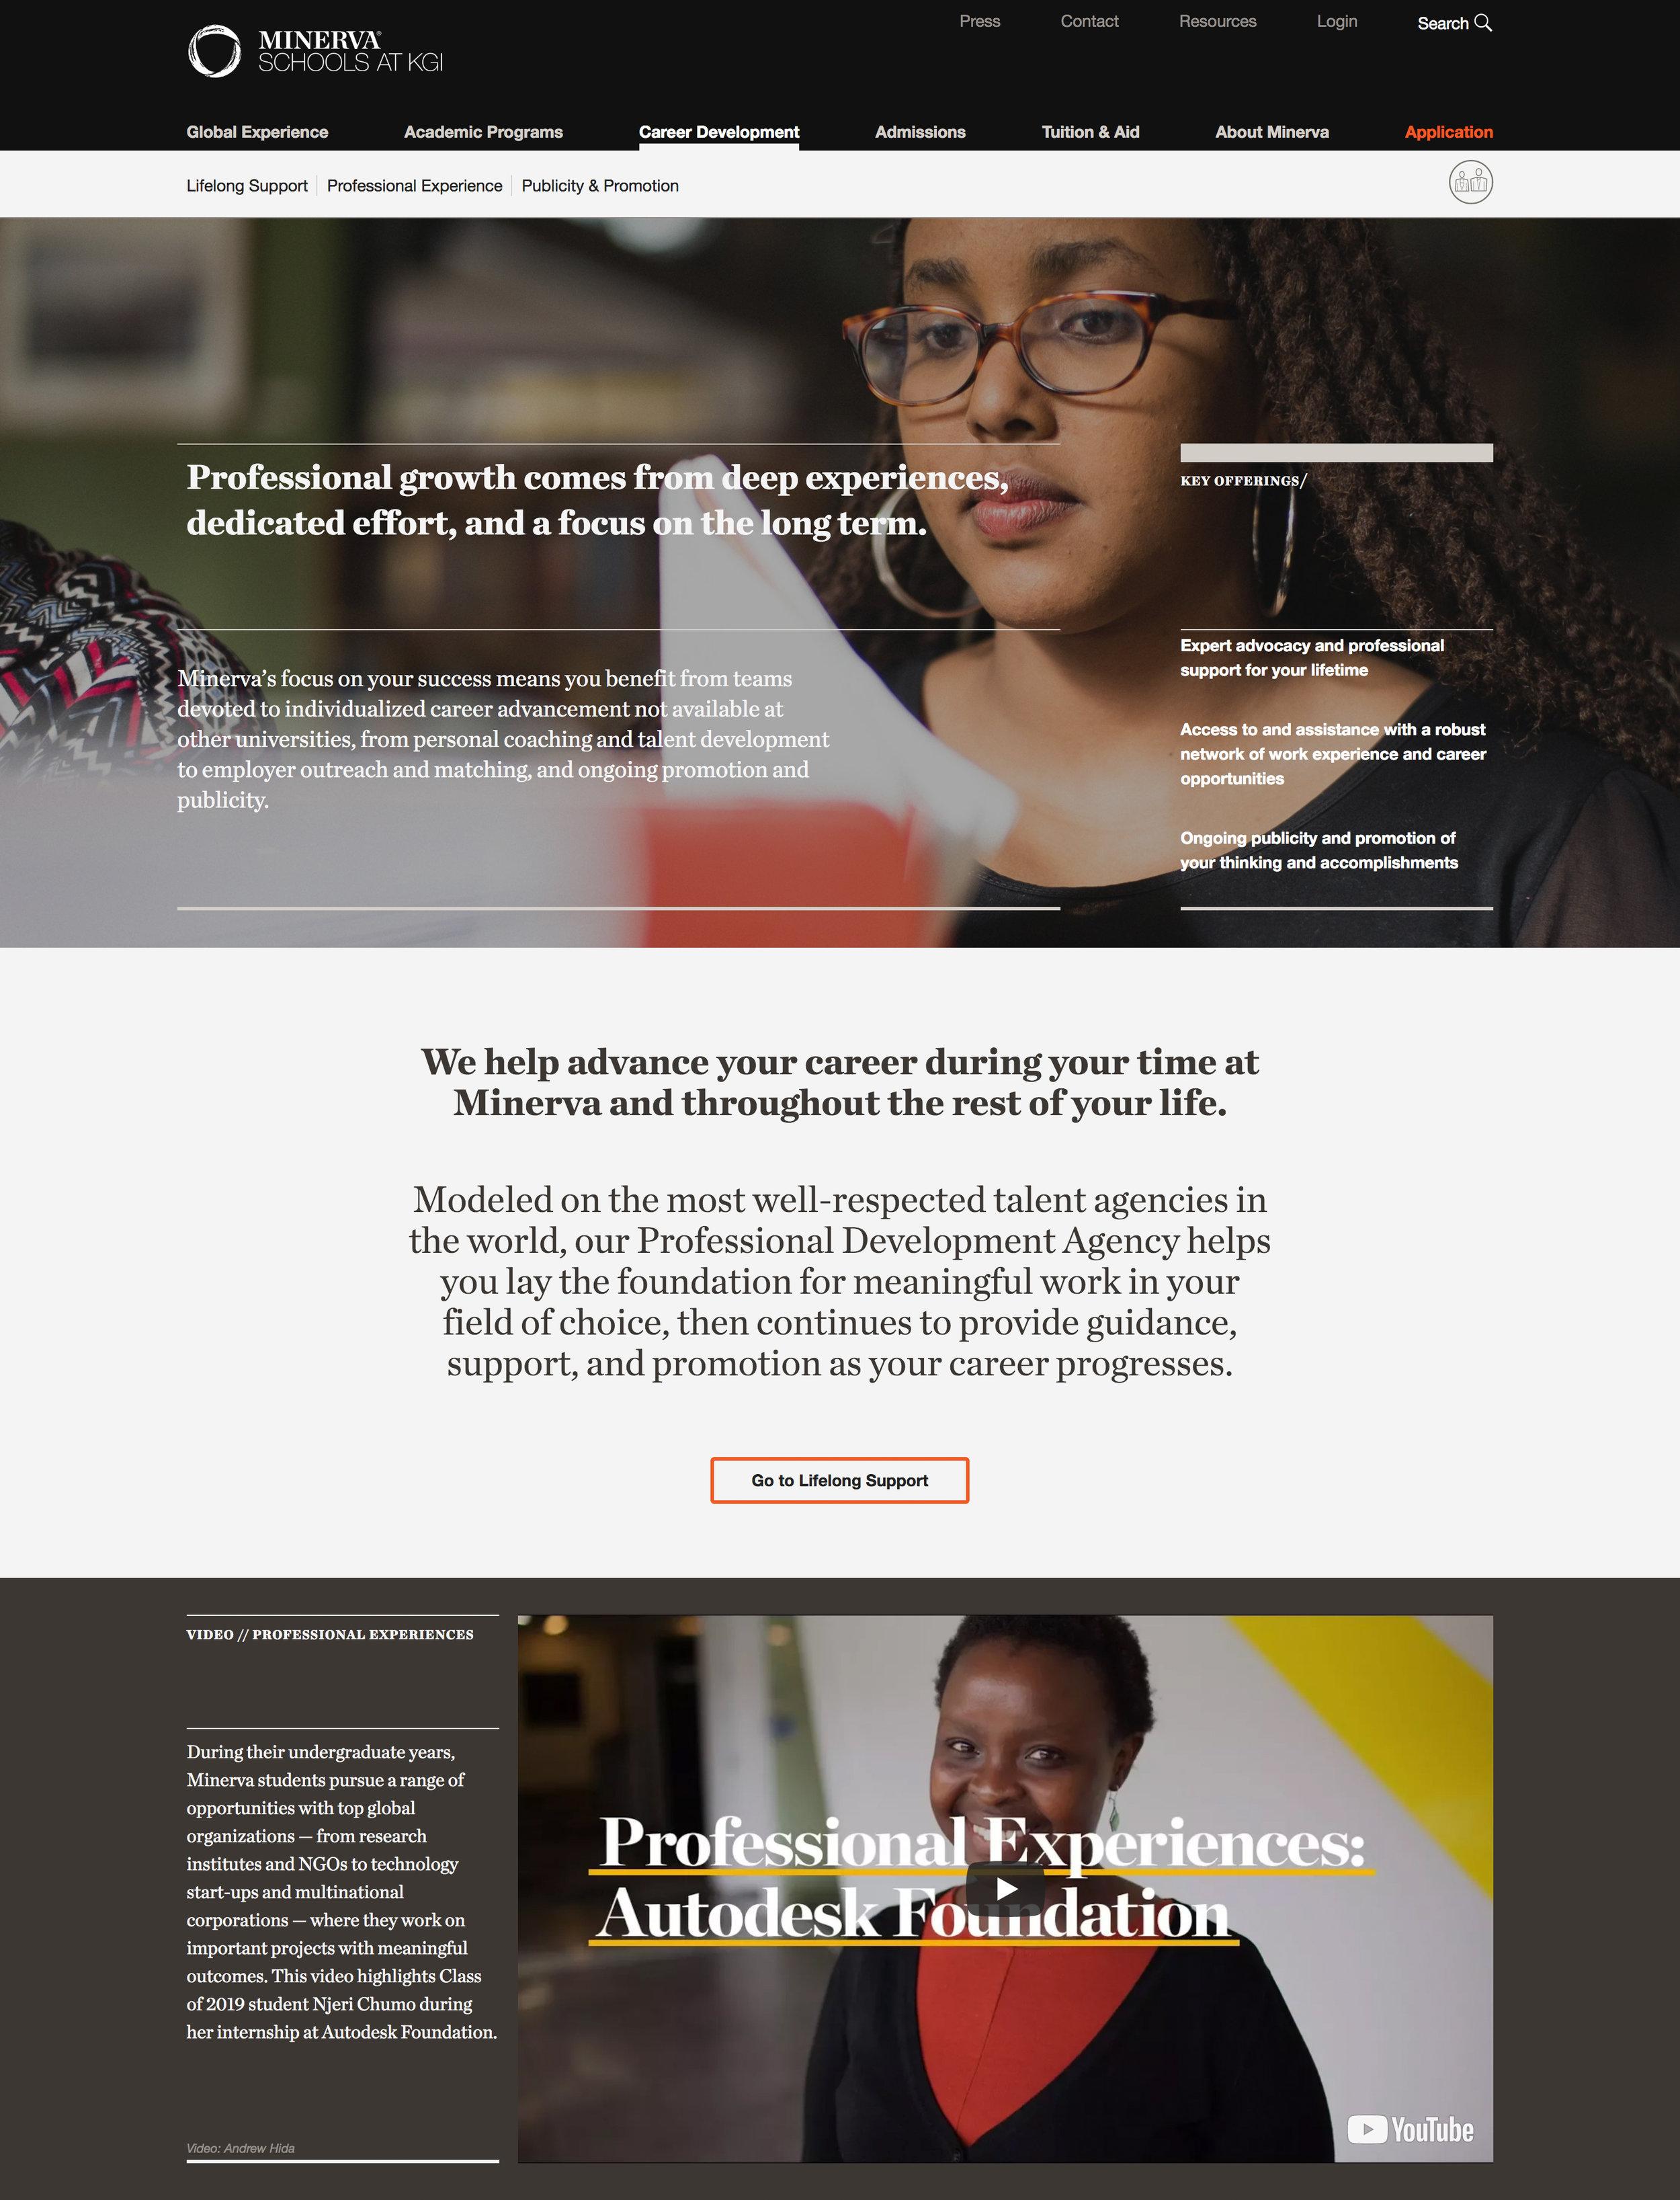 2018 Professional Experiences Publication.jpg